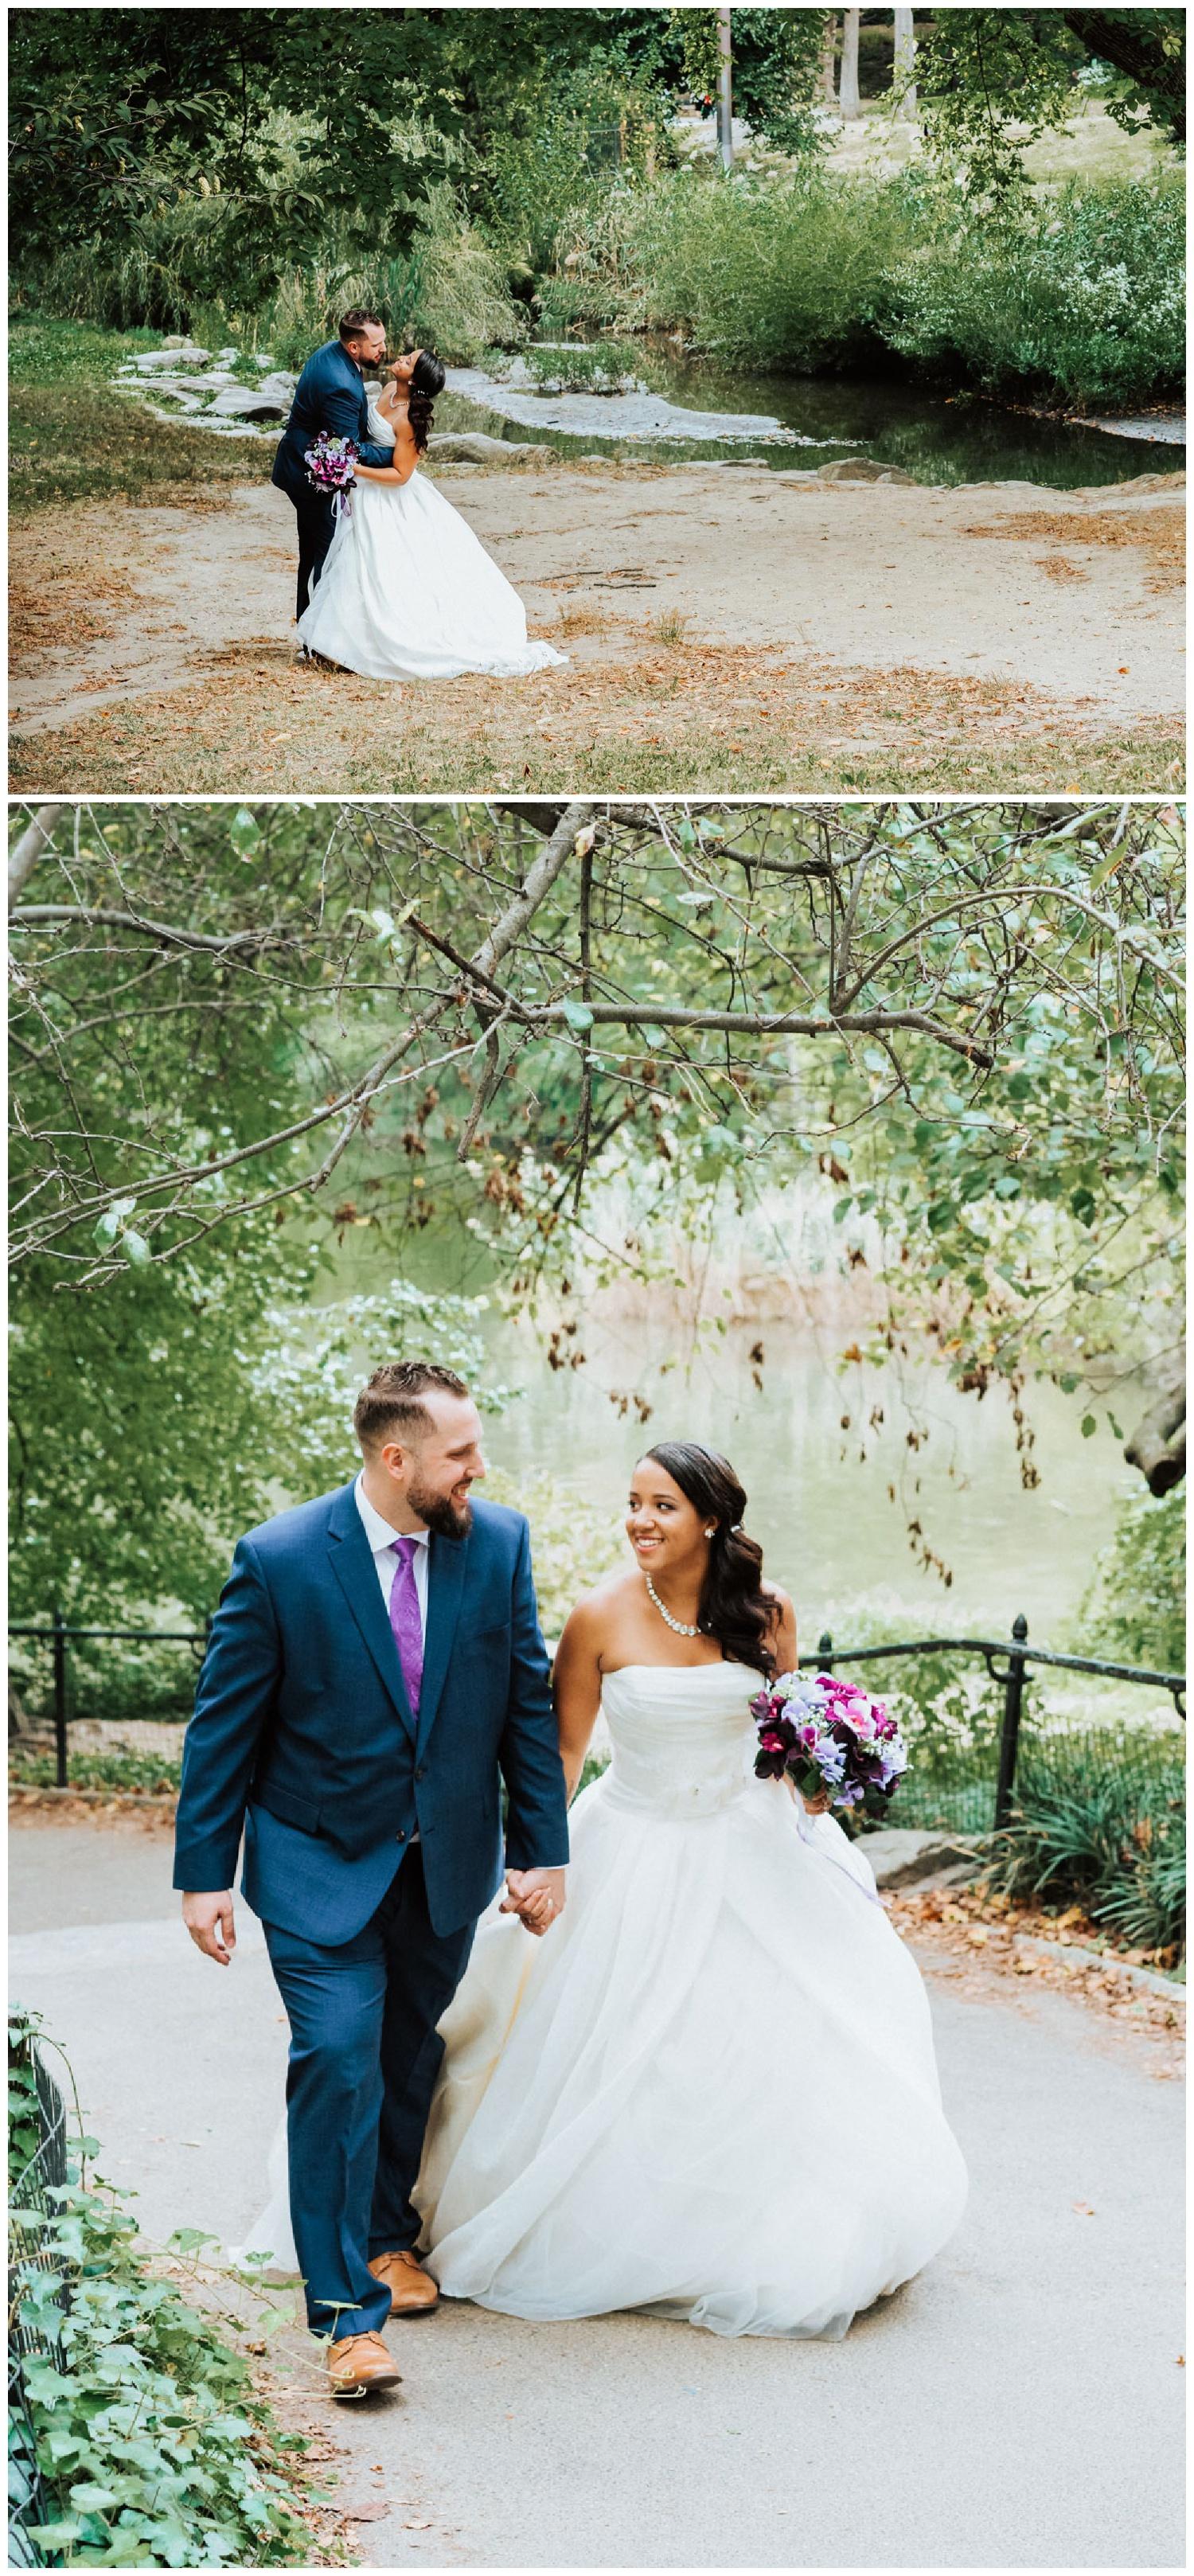 central park elopement new york city wedding photographer